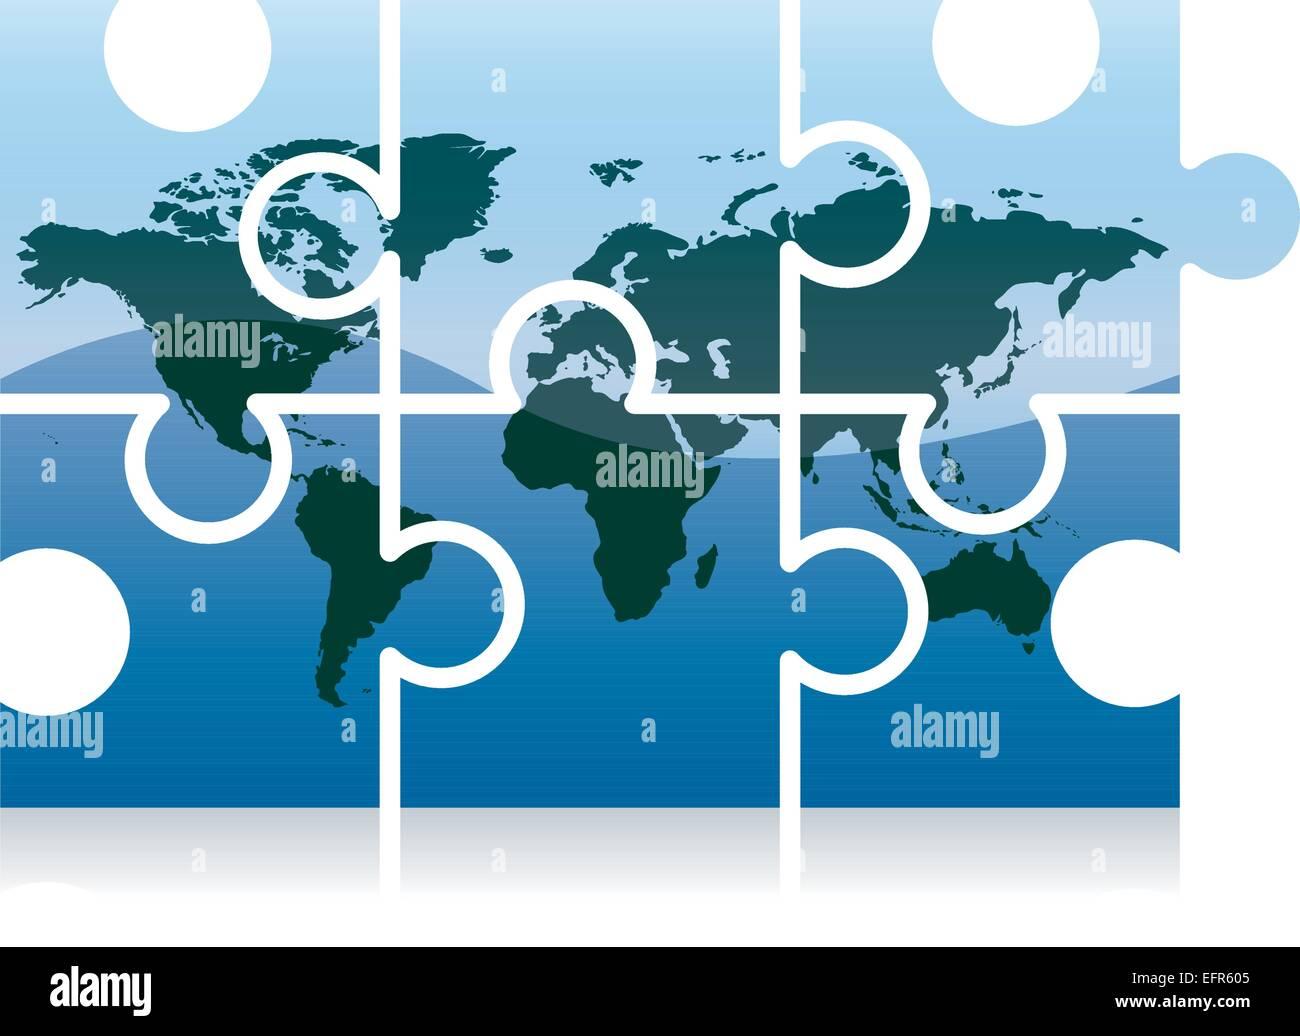 Shiny jigsaw world map puzzle icon vector illustration stock shiny jigsaw world map puzzle icon vector illustration gumiabroncs Choice Image